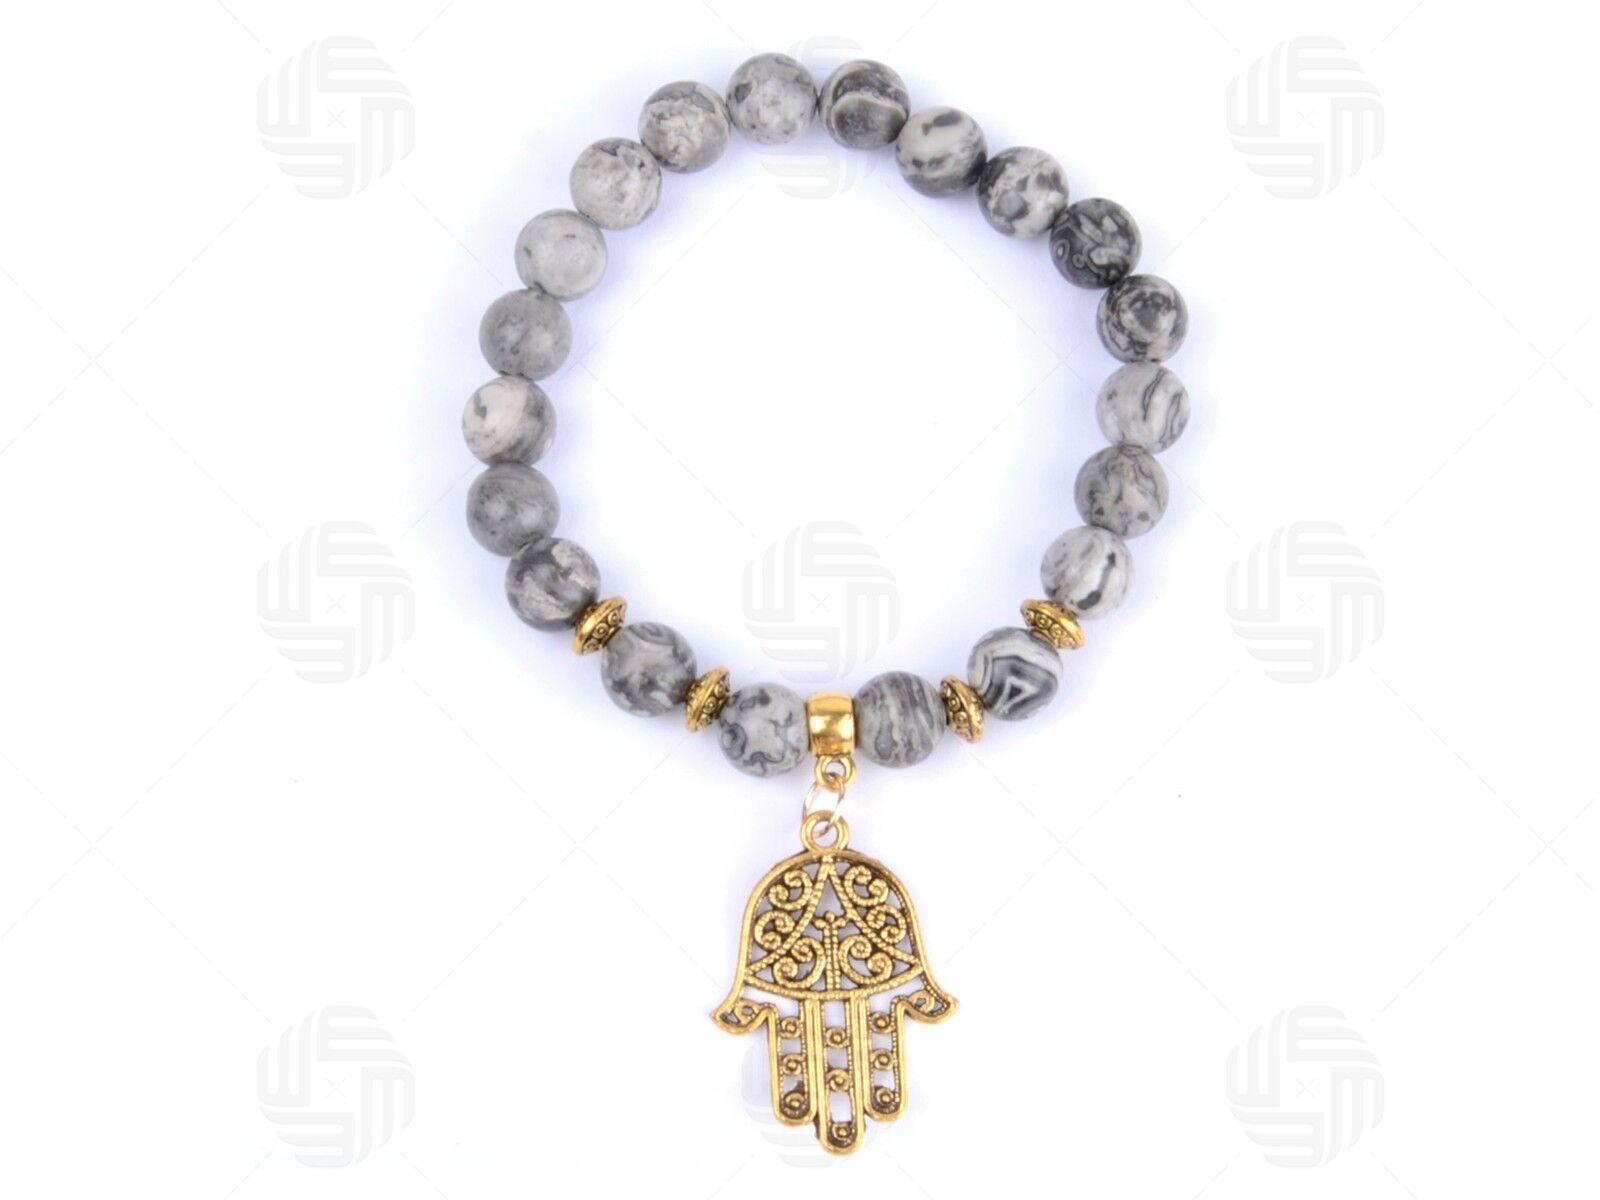 Hamsa Hand of God Protection Turquoise Yoga Amulet Antique Brass Long Necklace